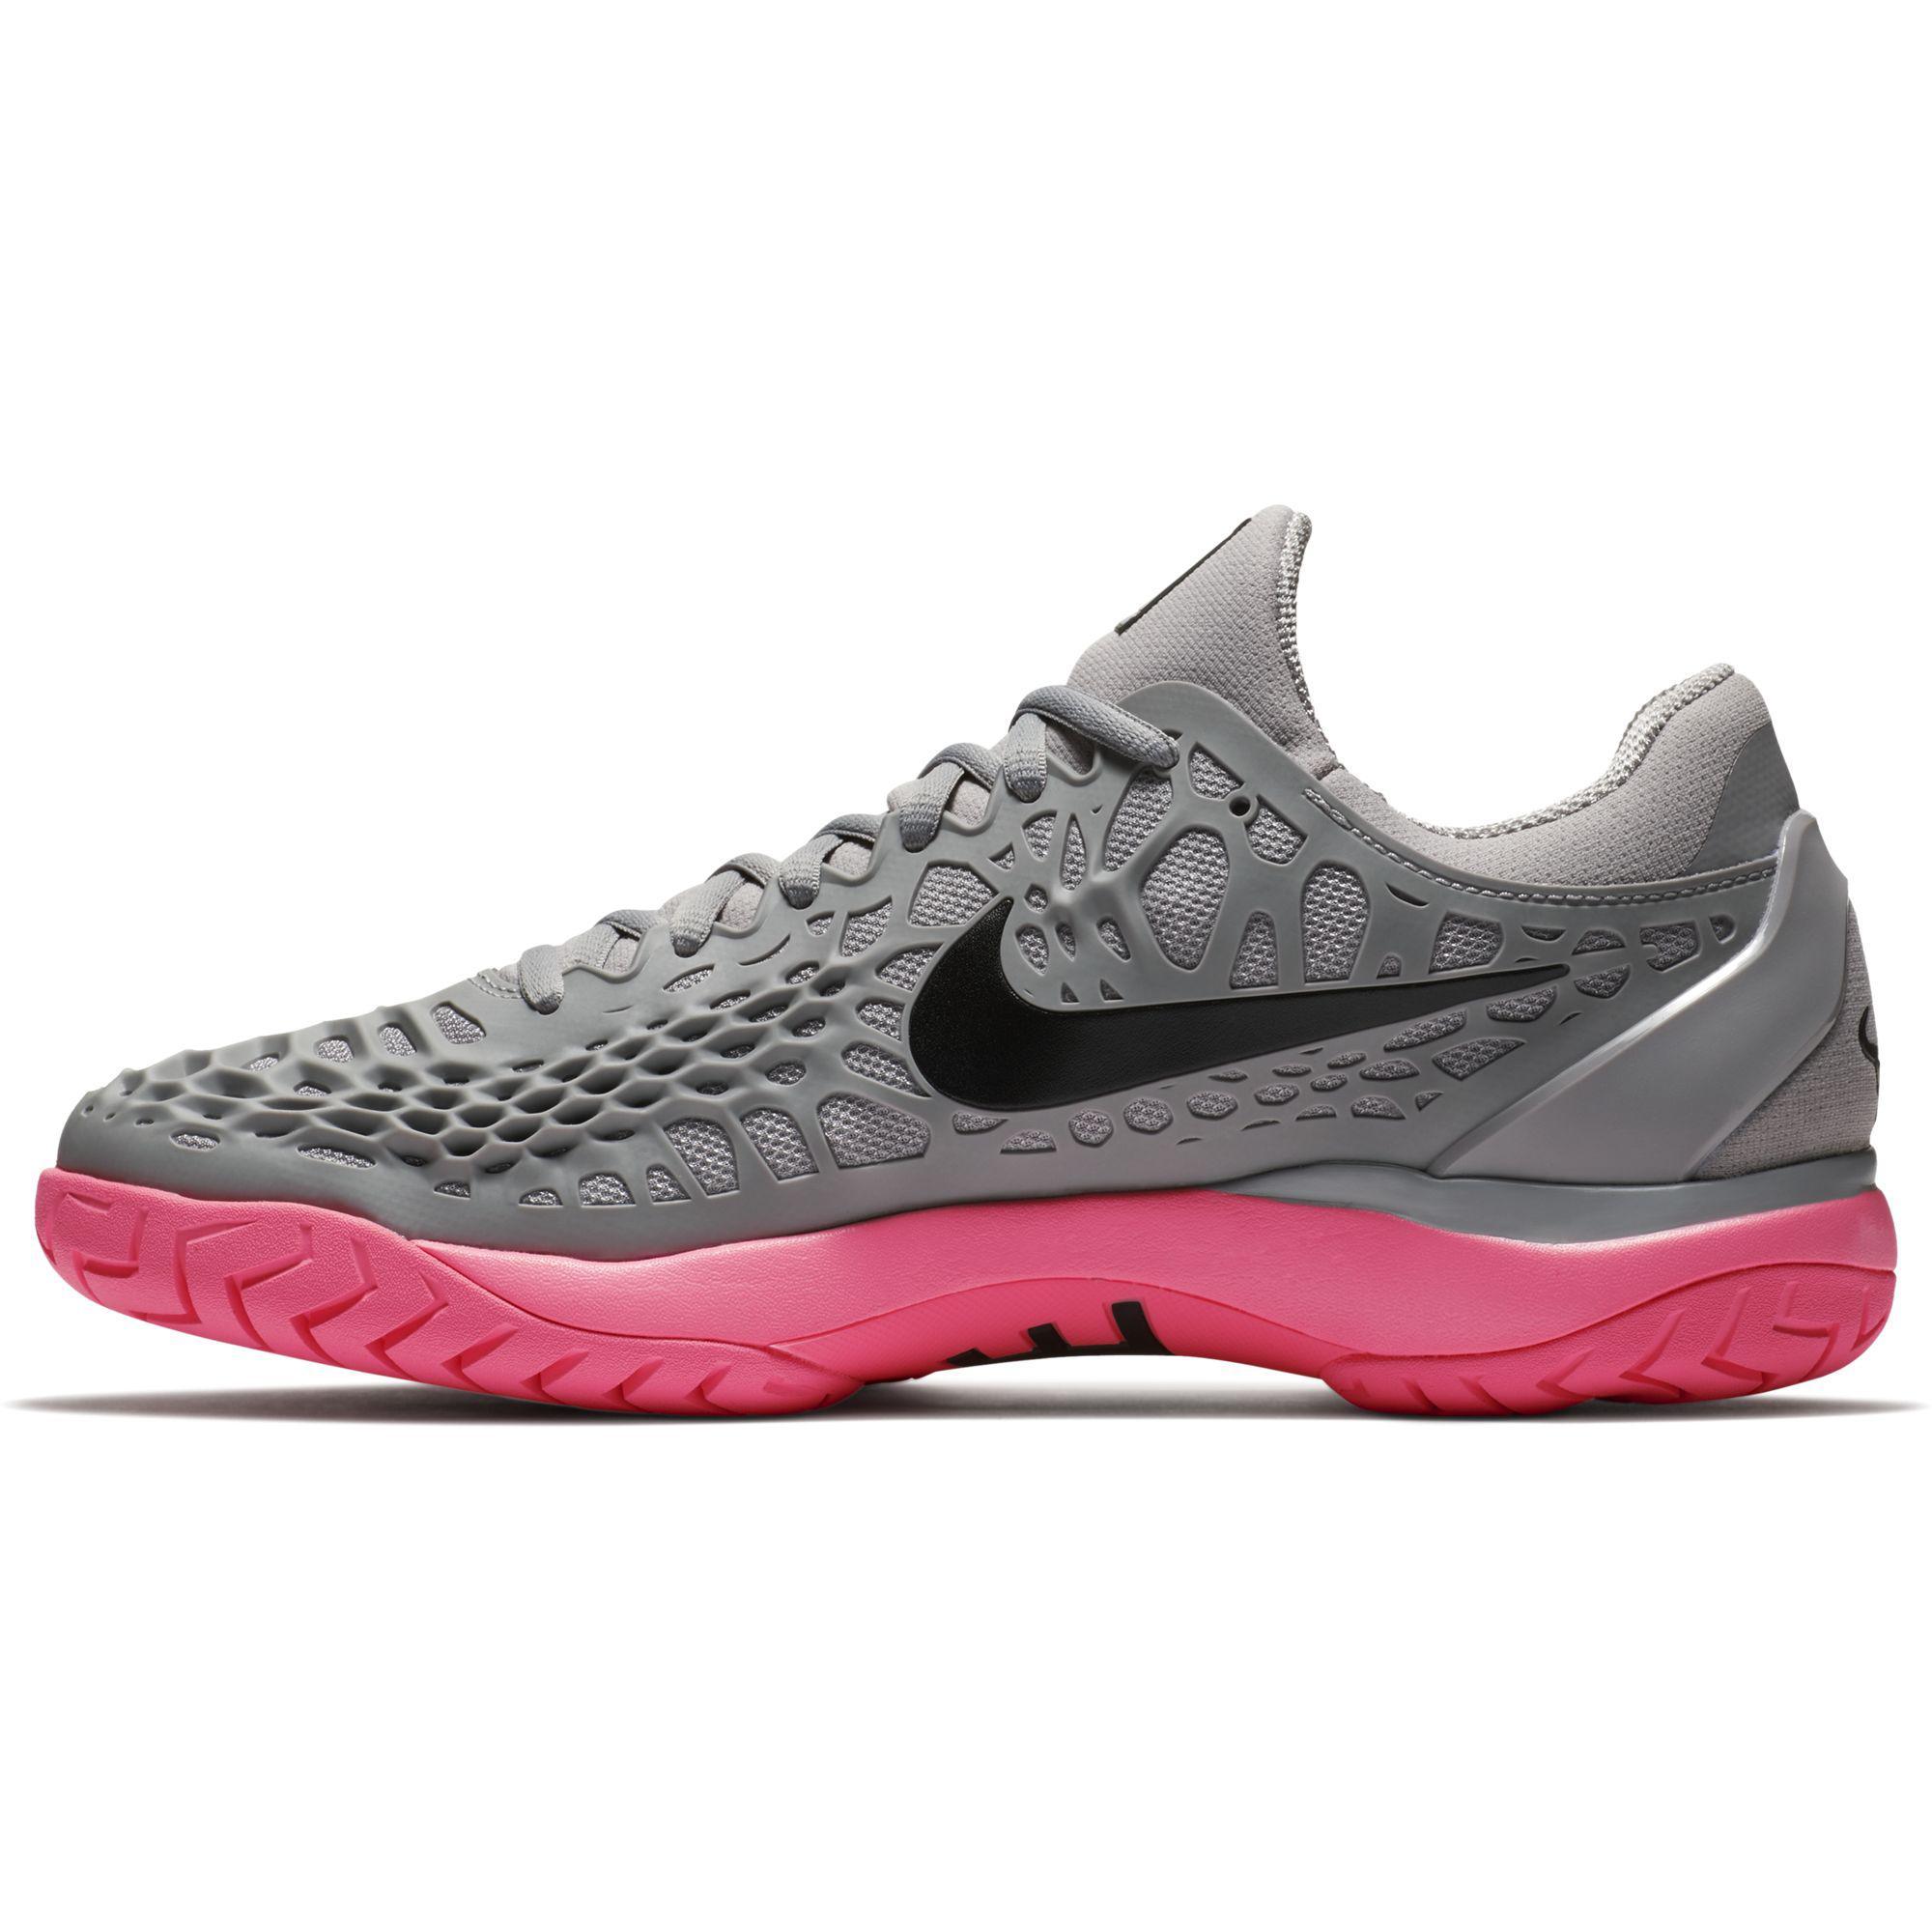 7e13f15aad38 Nike Mens Air Zoom Cage 3 Rafa Tennis Shoes - Grey Sunset Pulse ...